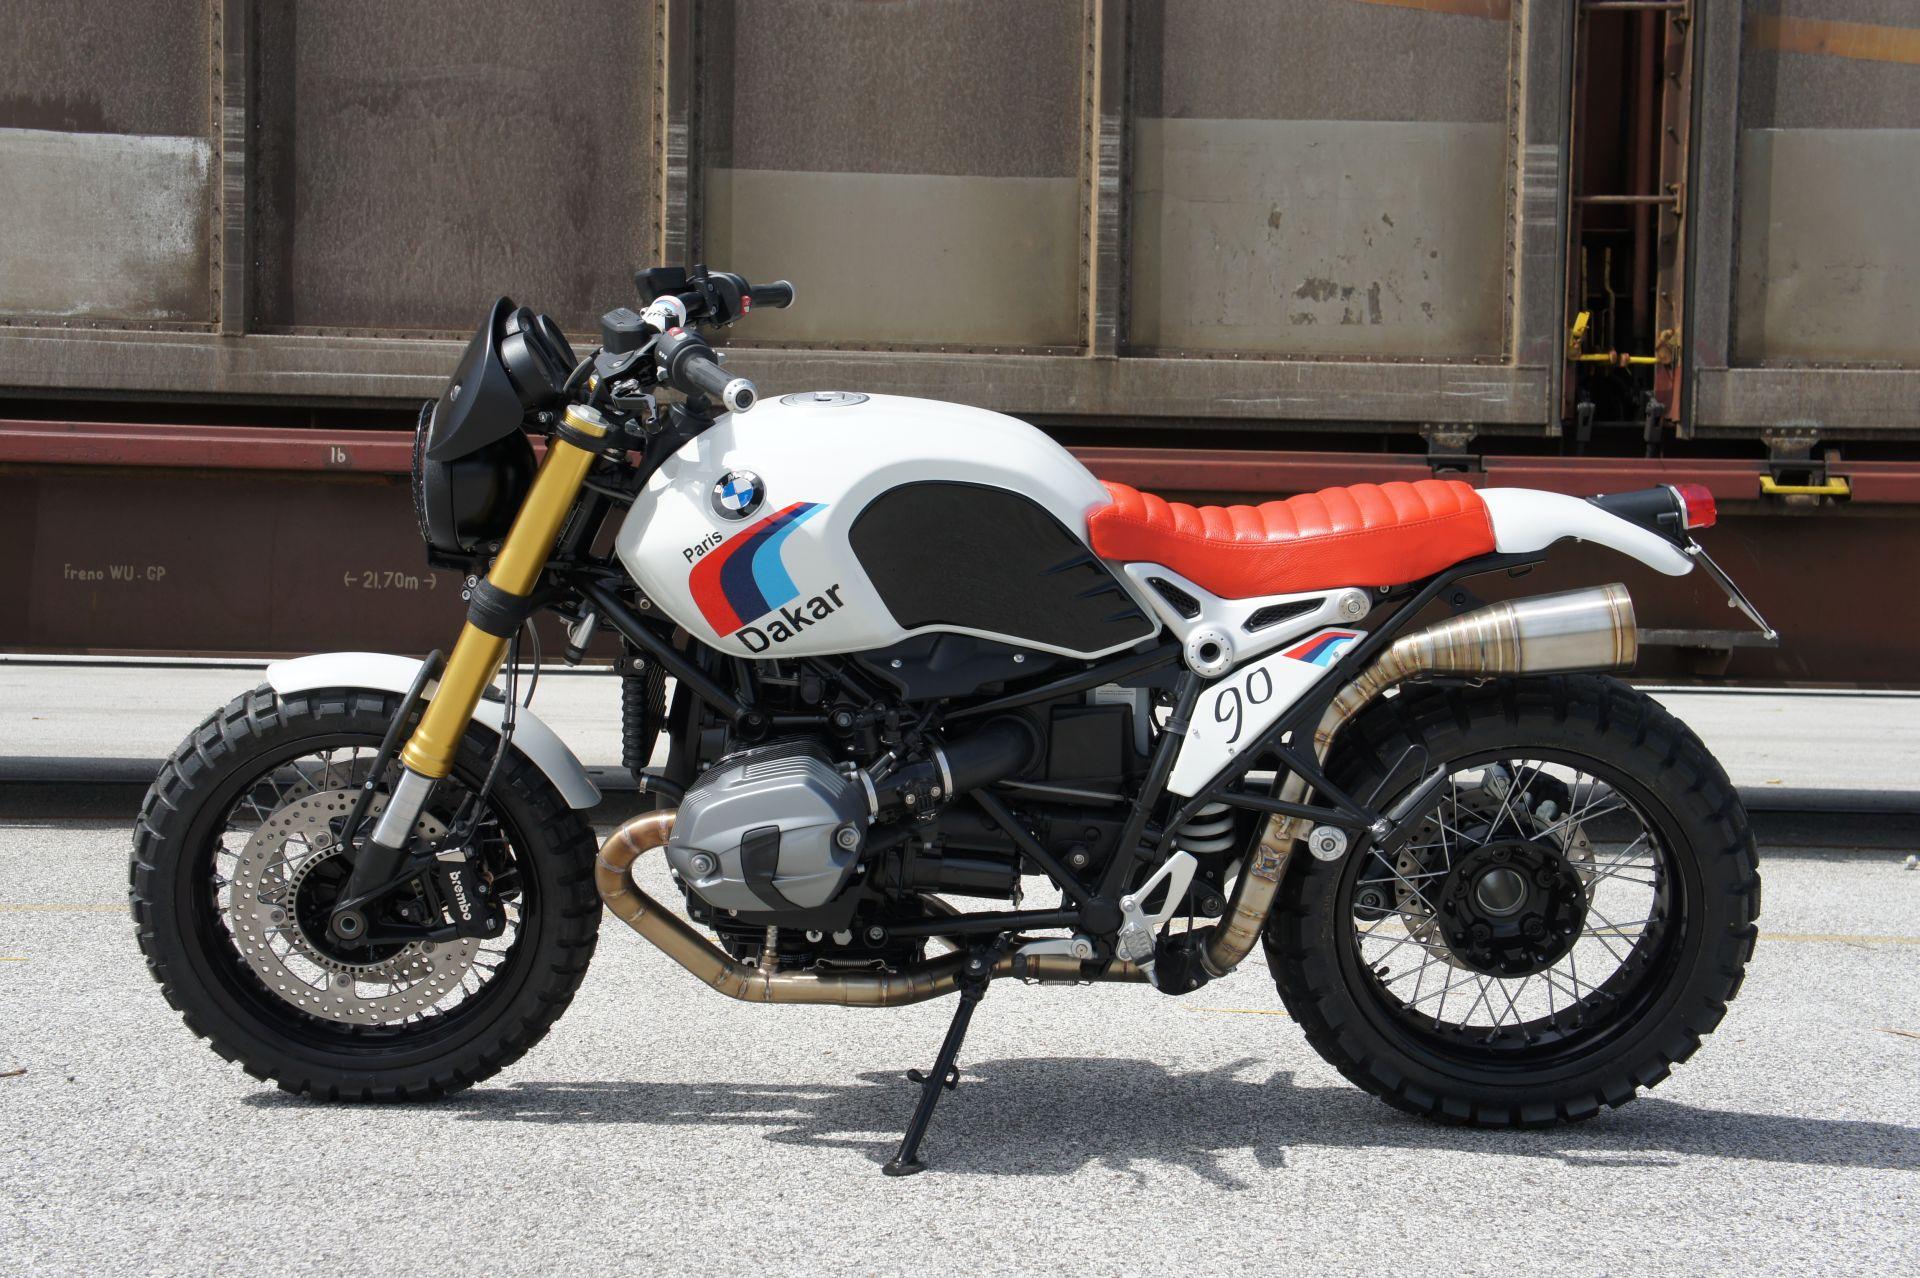 Build a Breathtaking Paris-Dakar BMW R nineT with the Luismoto Kit ...